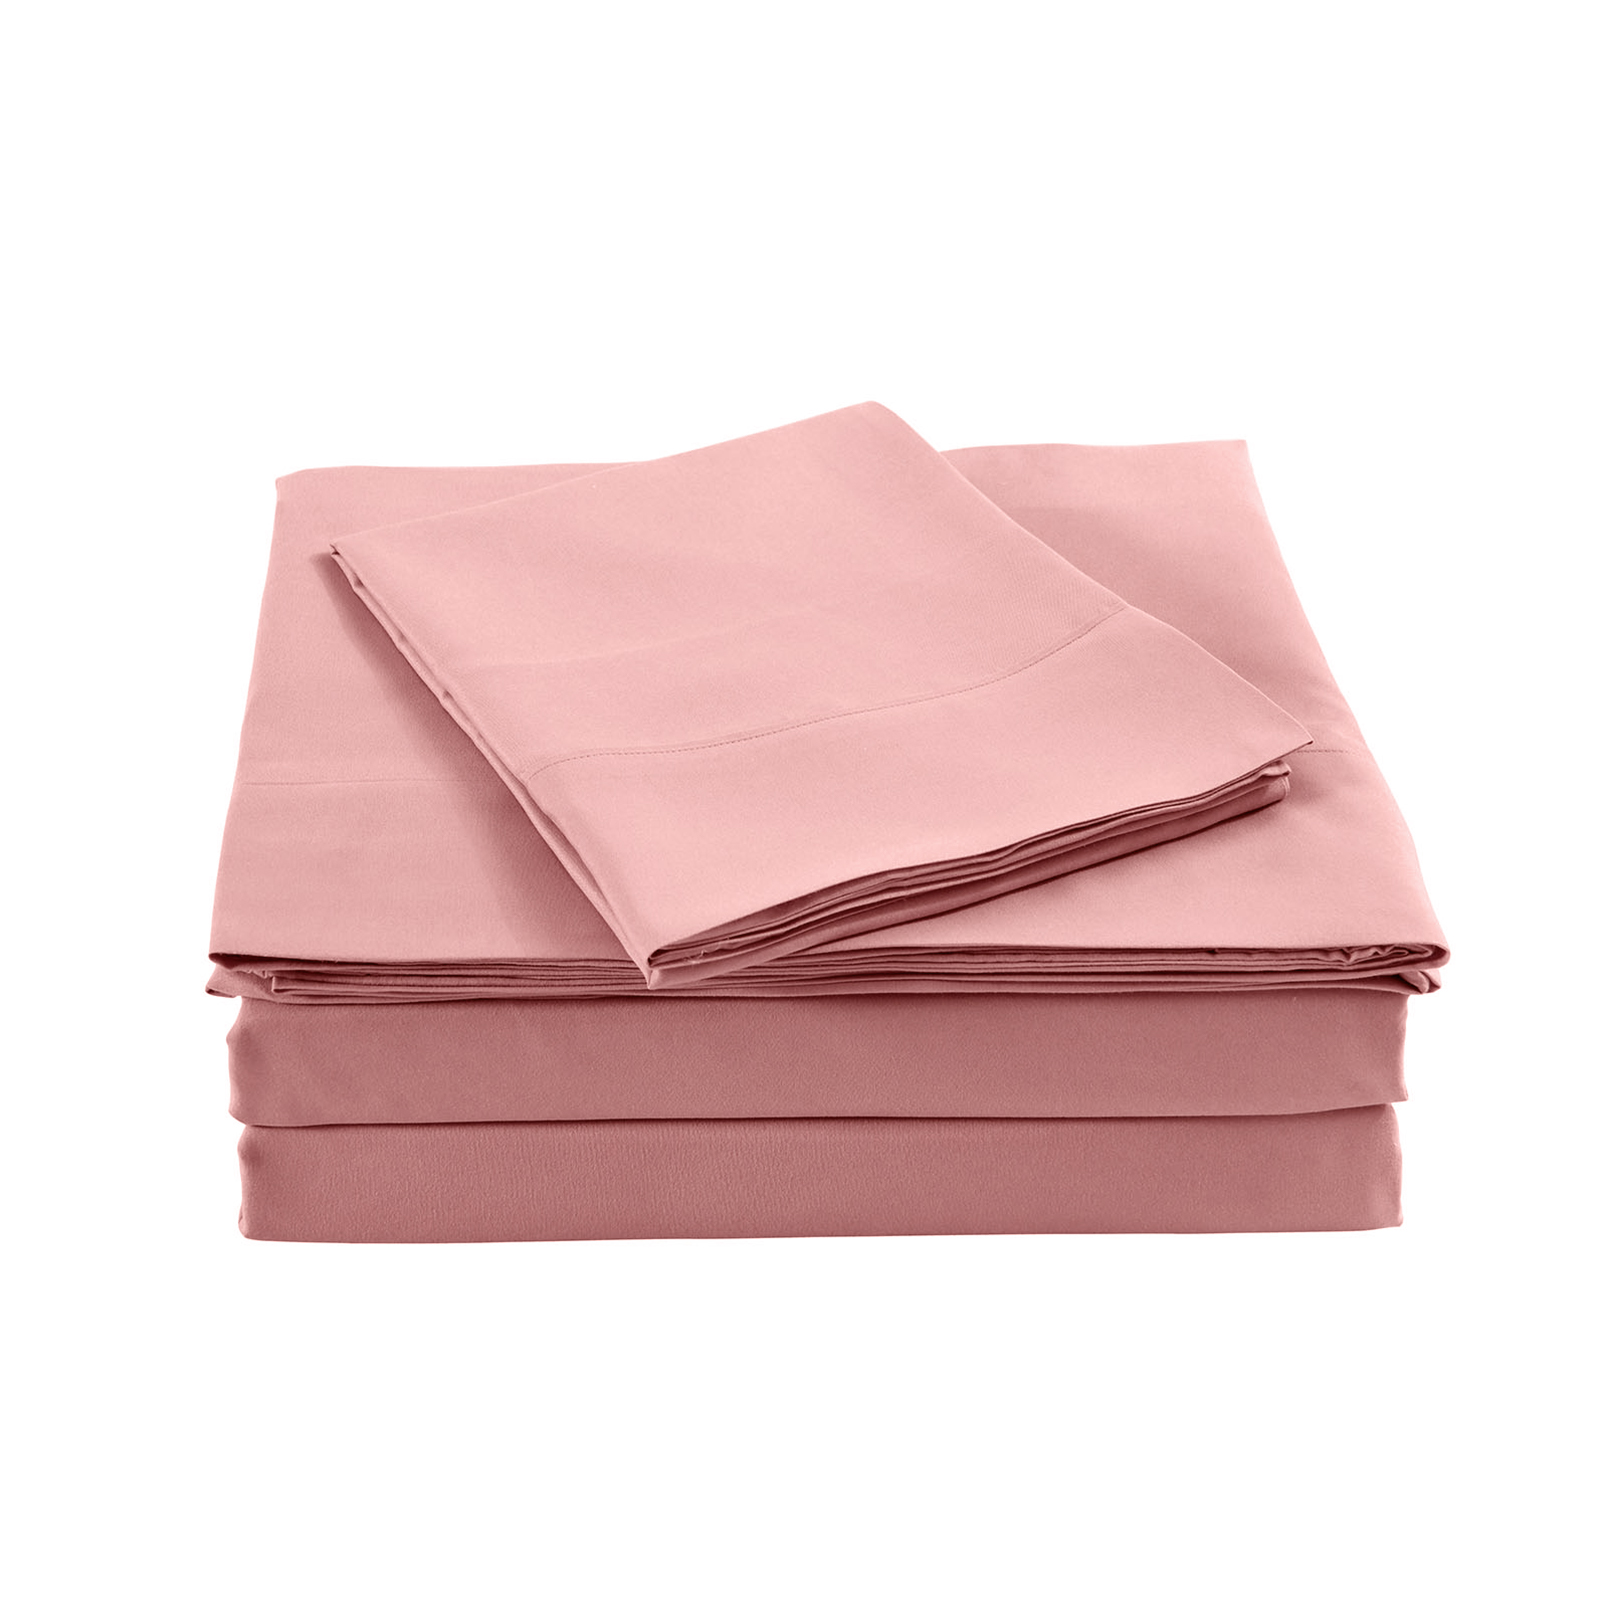 Royal-Comfort-Bamboo-Blended-Sheet-amp-Pillowcases-Set-1000TC-Ultra-Soft-Bedding thumbnail 13